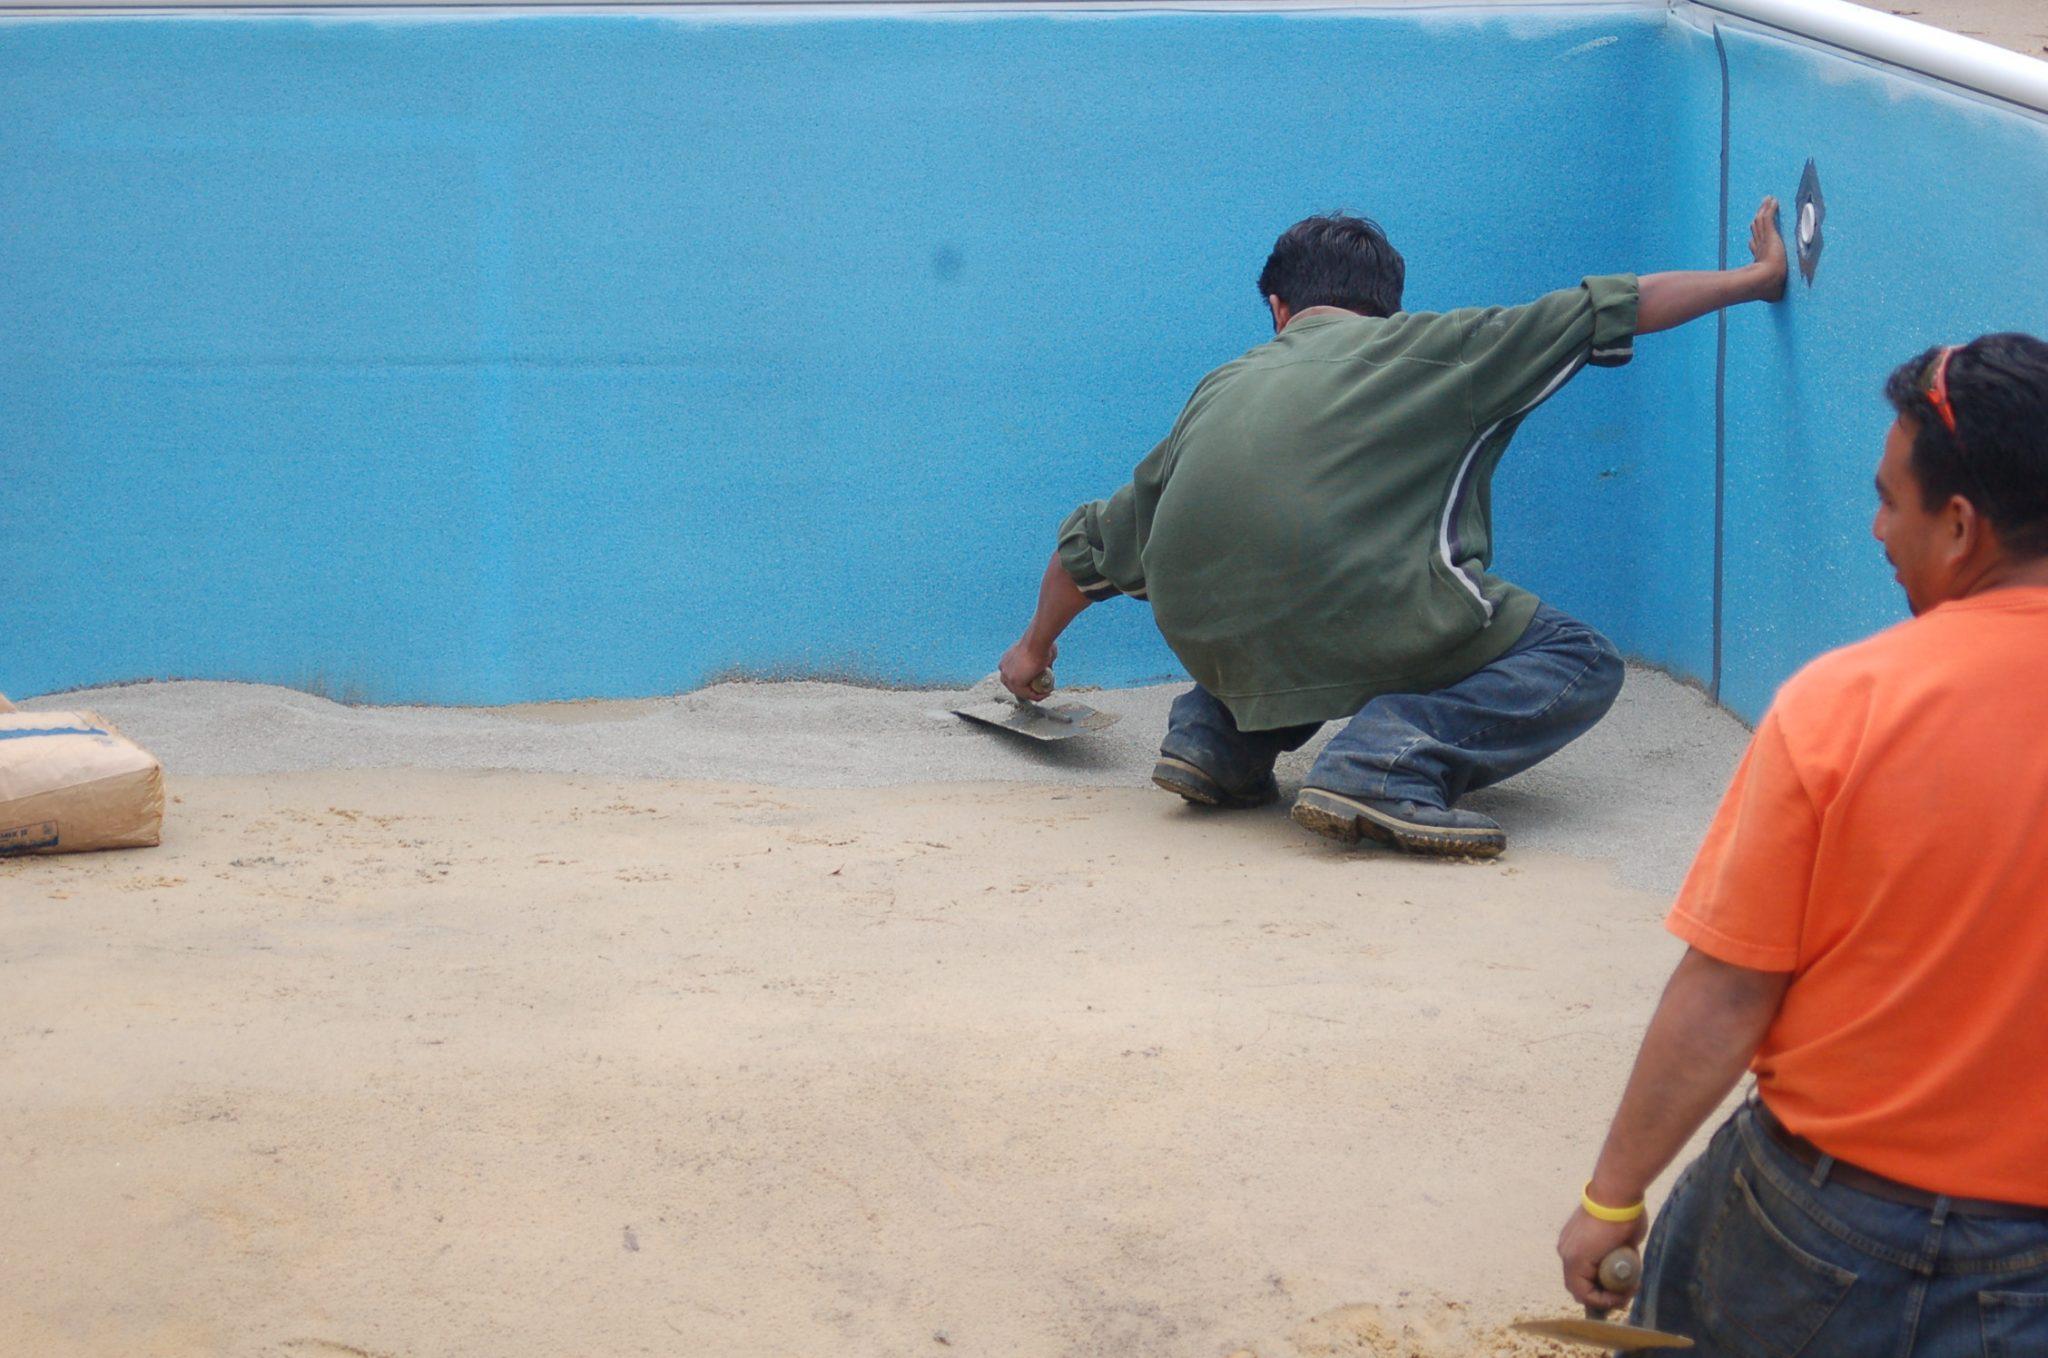 elite print pool pump padding outdoor wicker amazon frame com set x w ground above summer floor waves dp garden